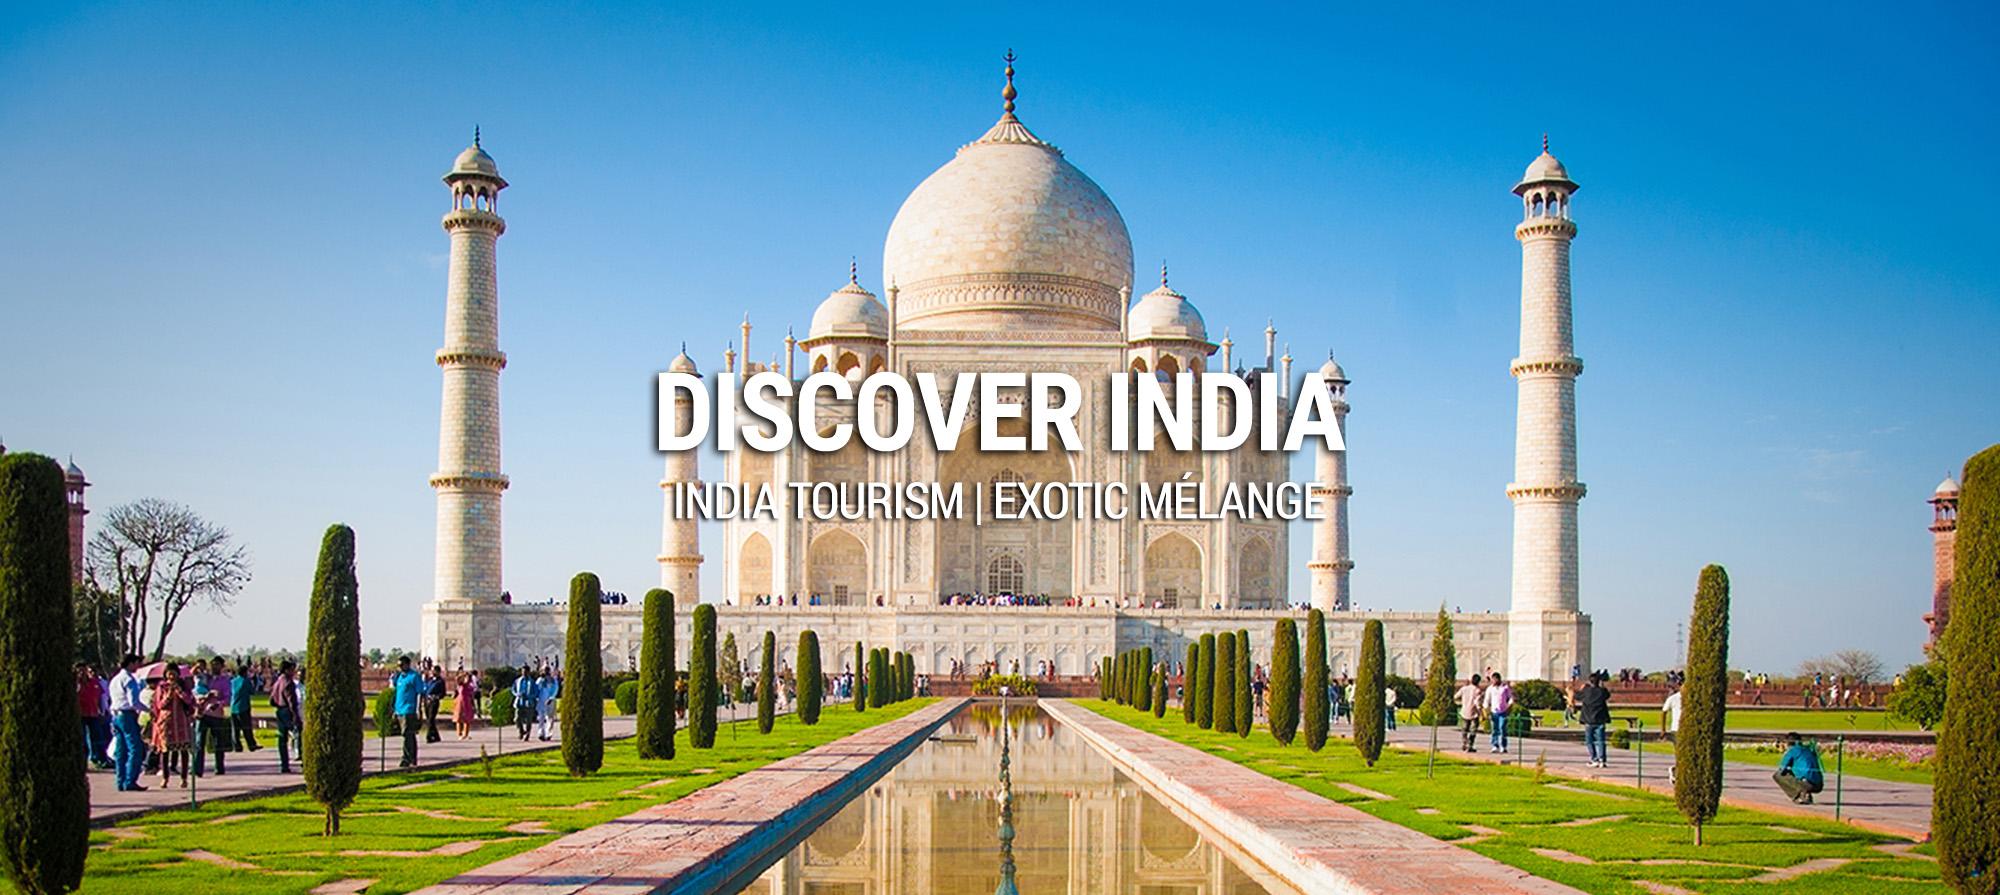 Glorious India - Discover India